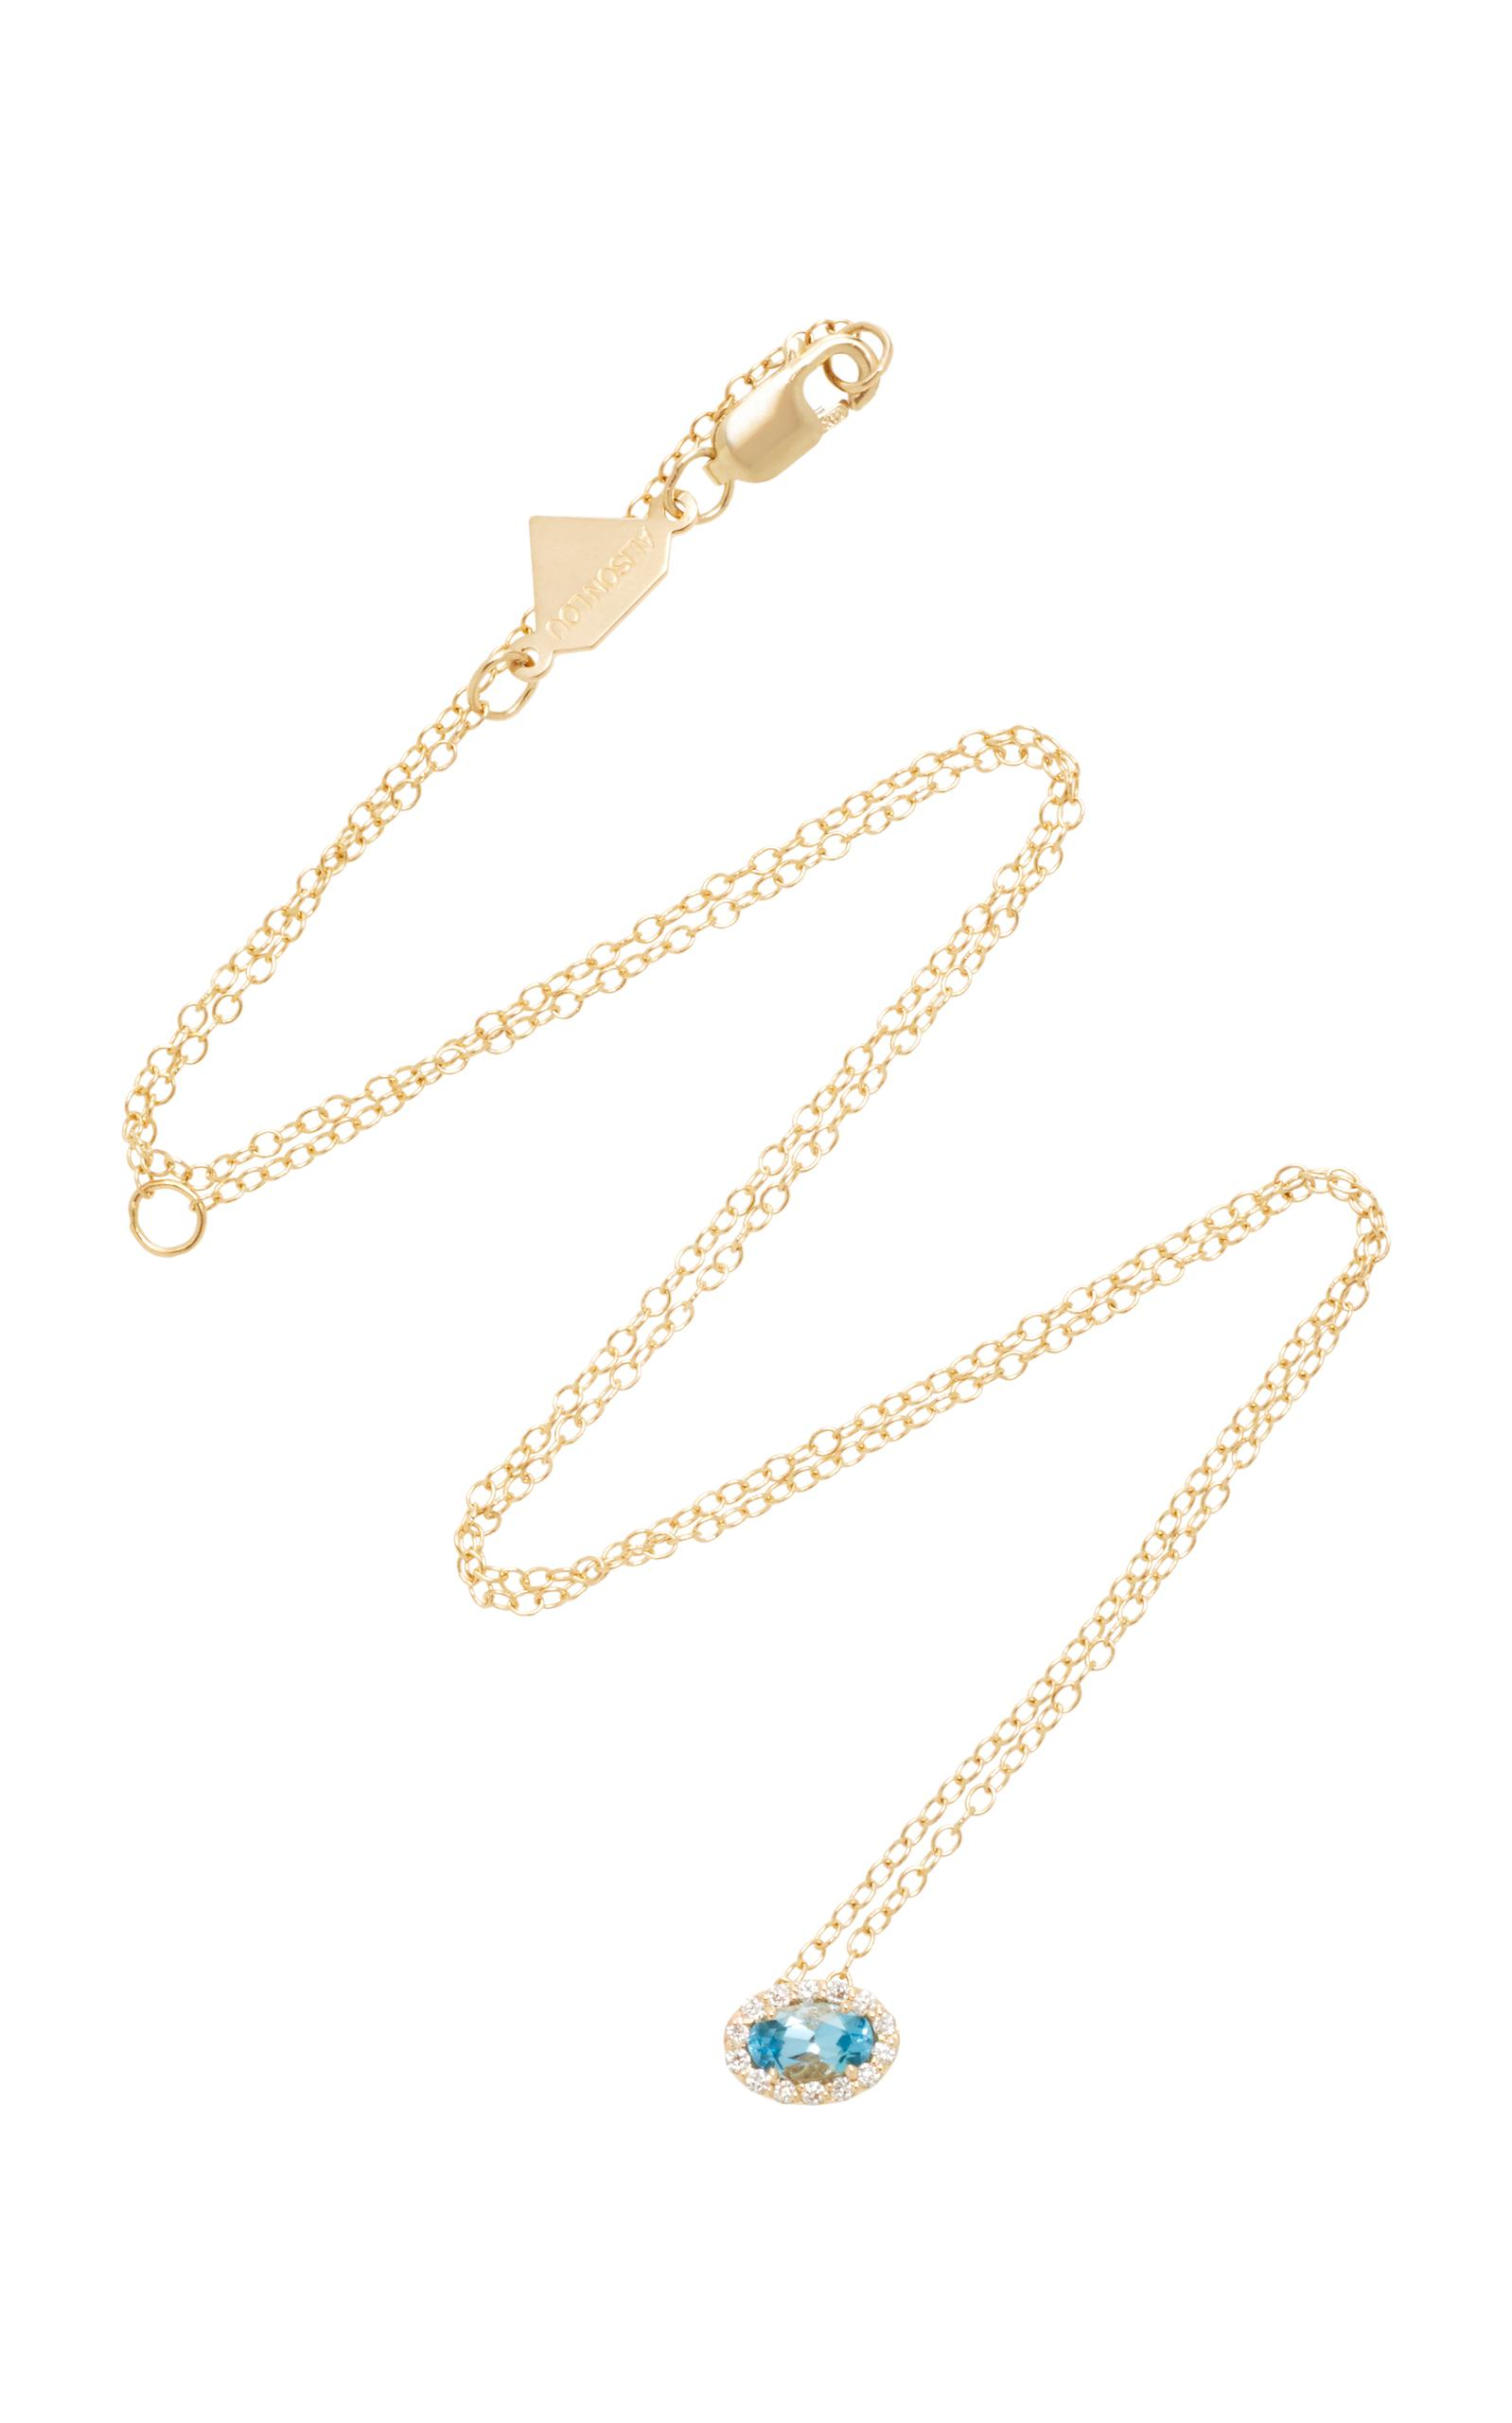 14K Gold Diamond Heart Necklace Alison Lou KwOeFaPFV